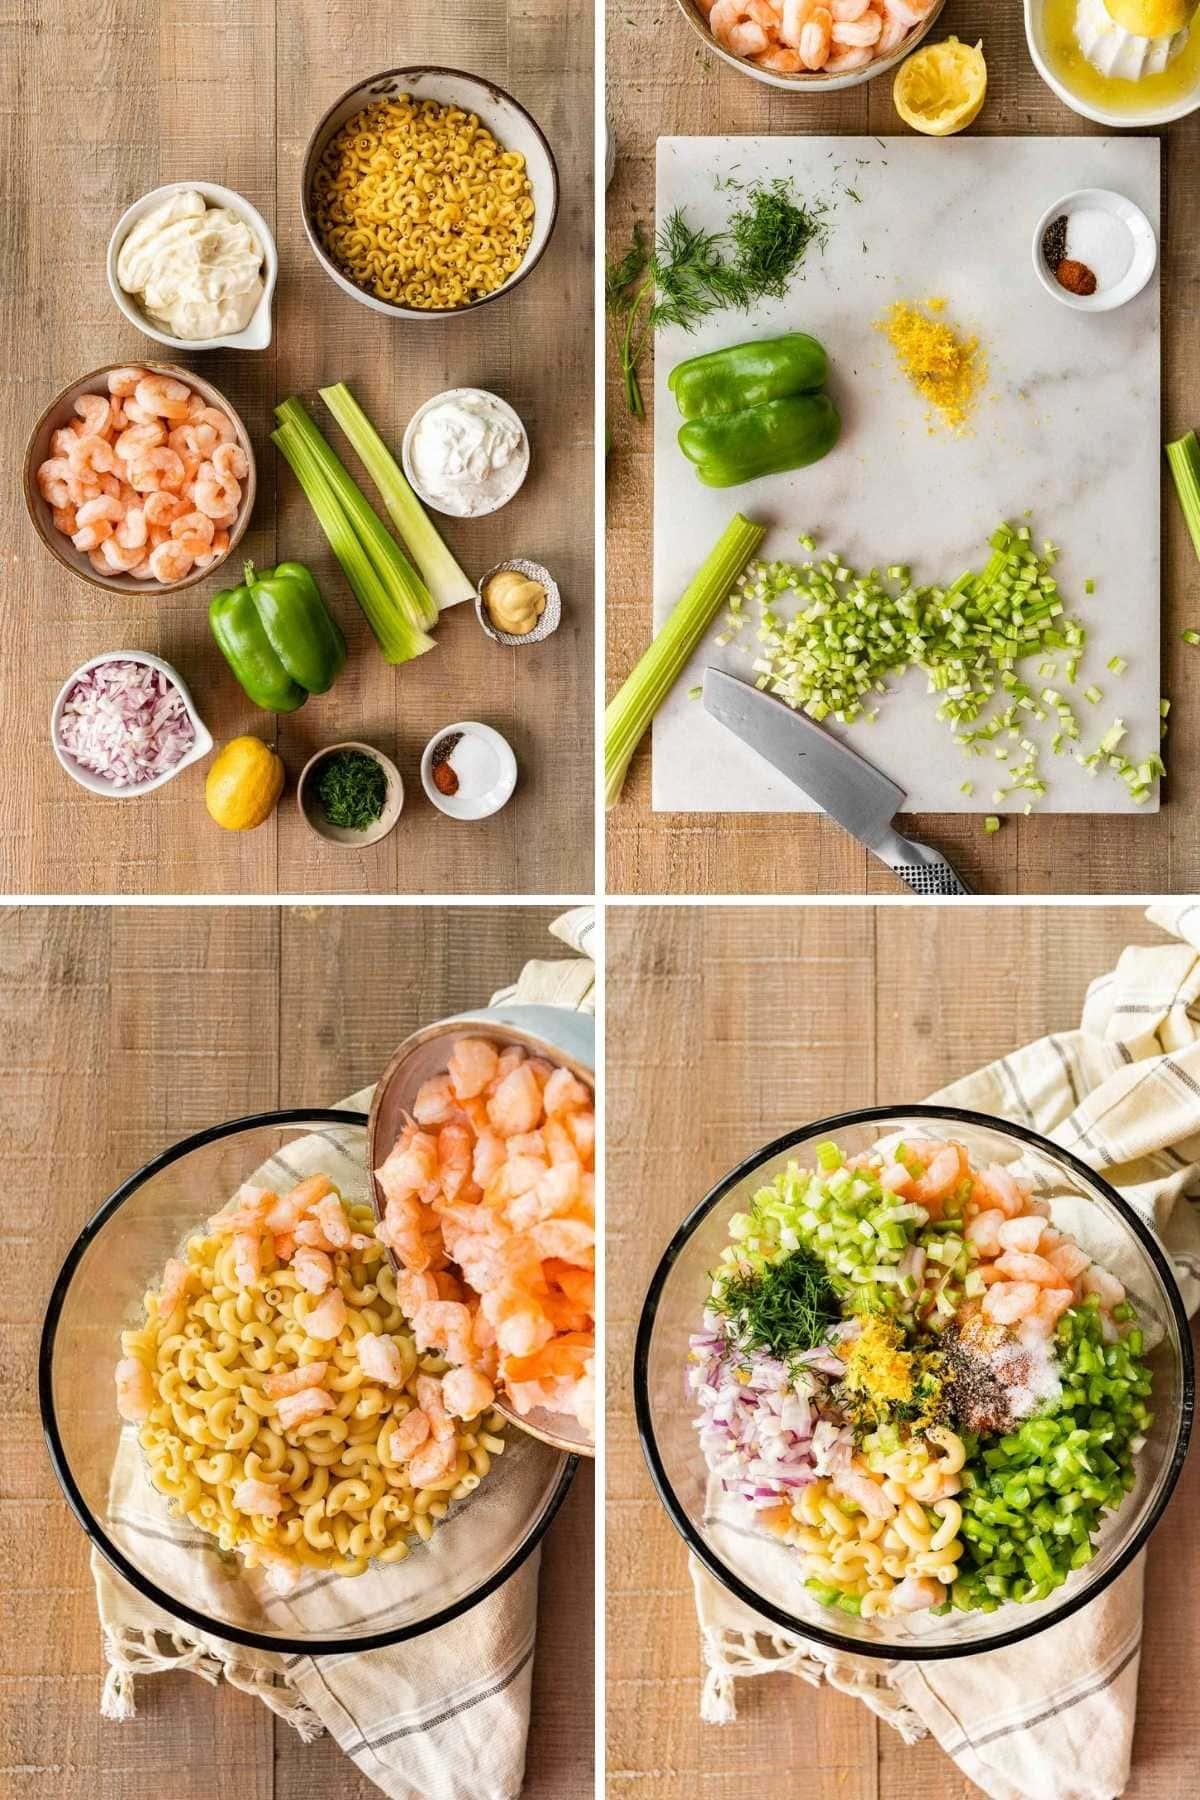 Creamy Shrimp Pasta Salad collage of prep steps